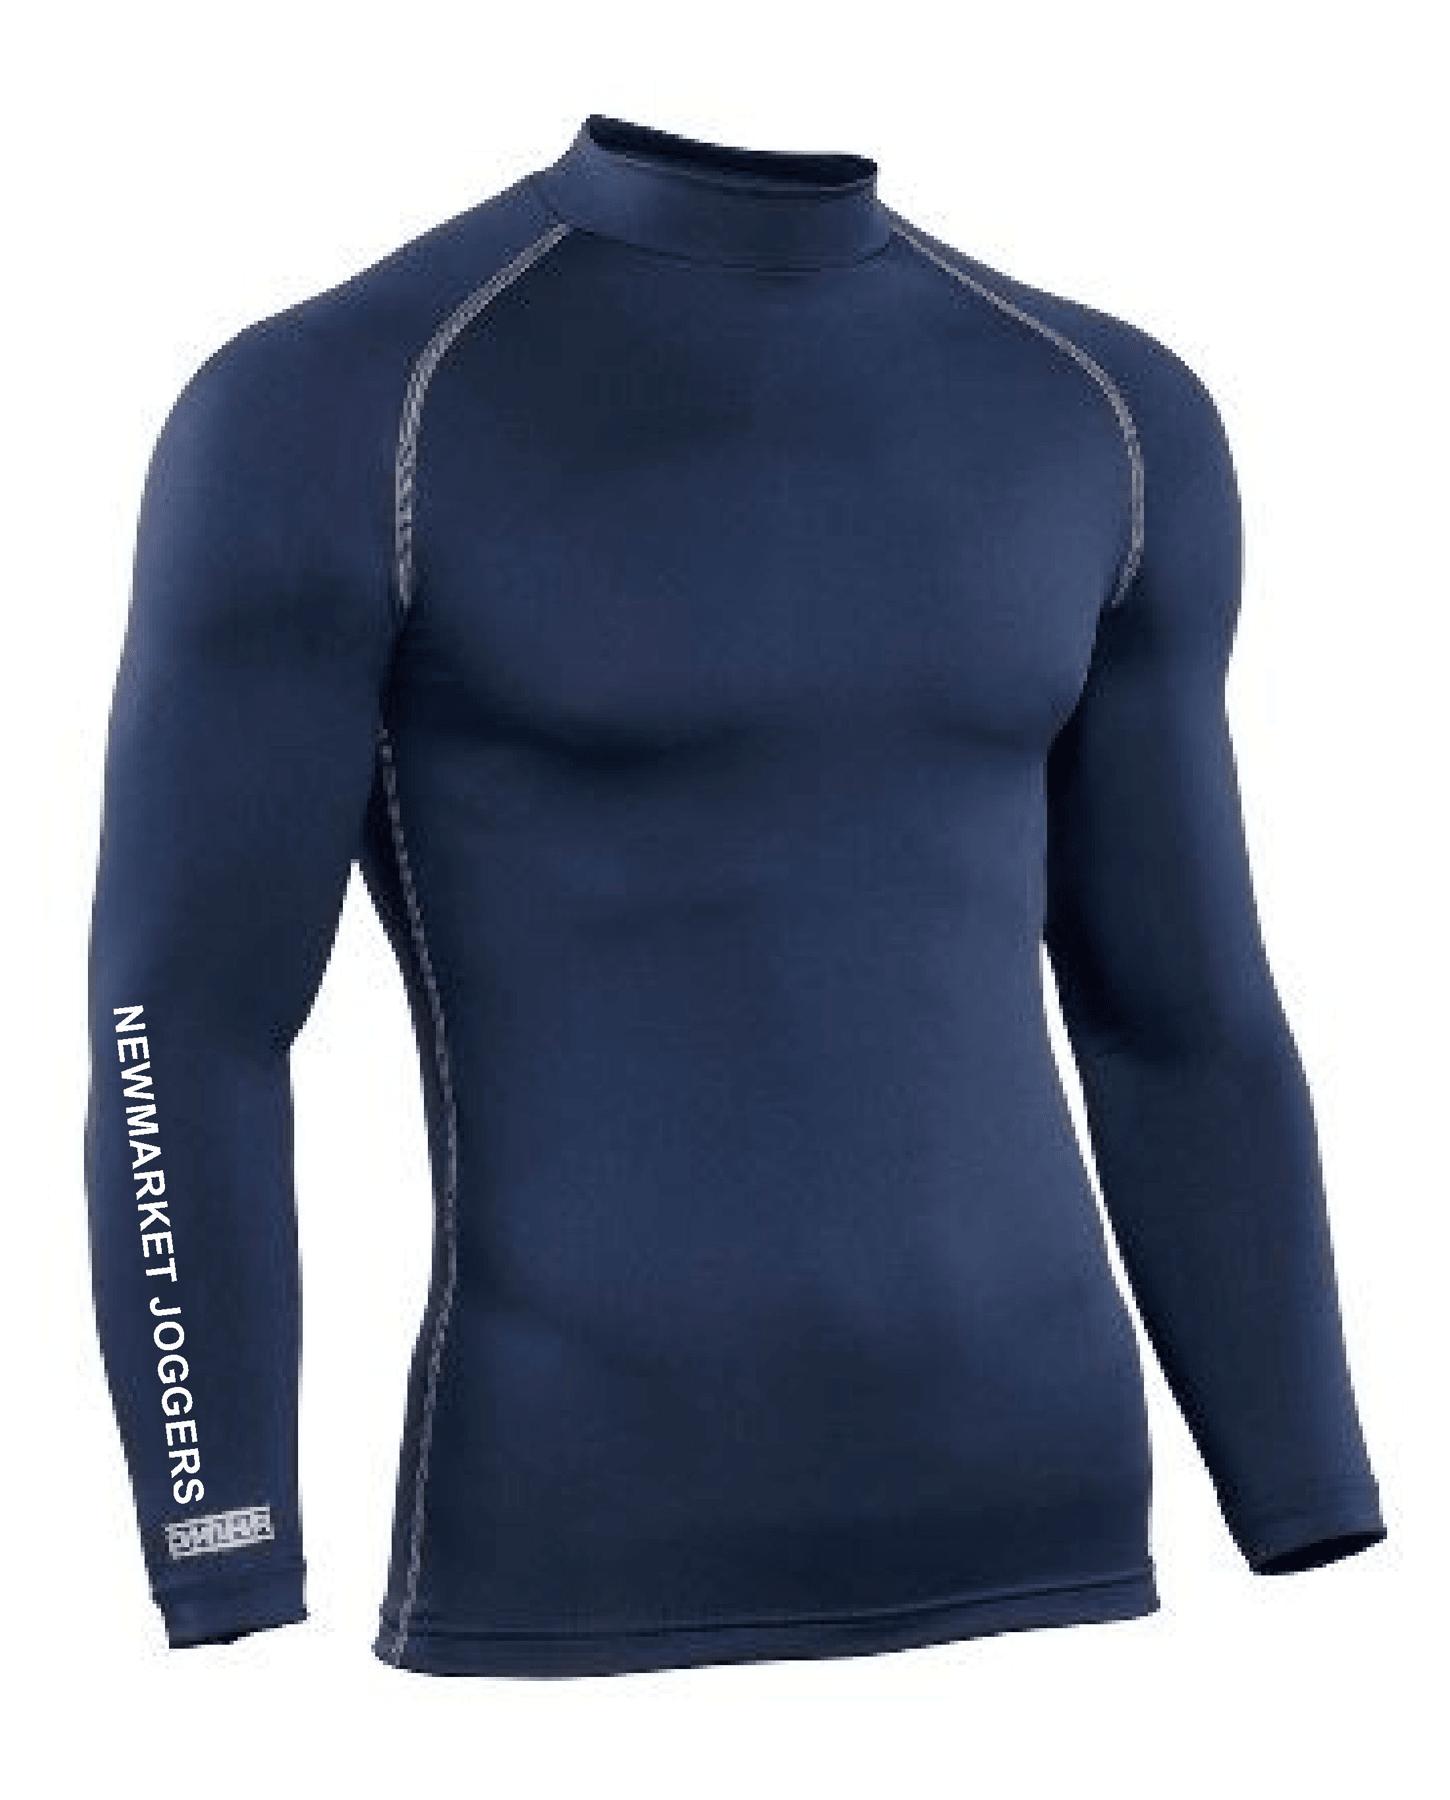 Newmarket Joggers – Baselayer (Unisex)